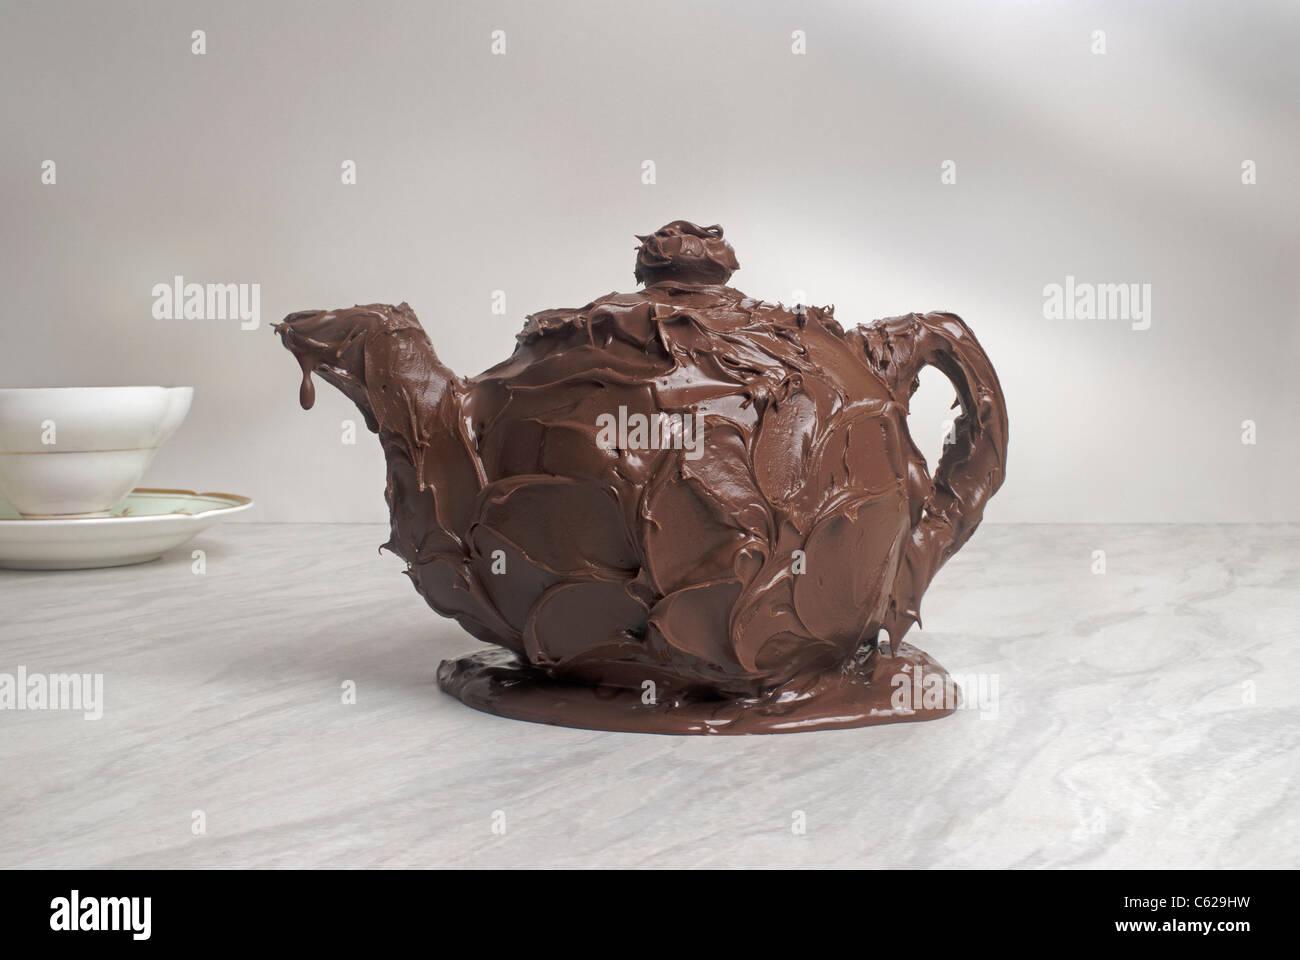 Chocolate teapot - Stock Image